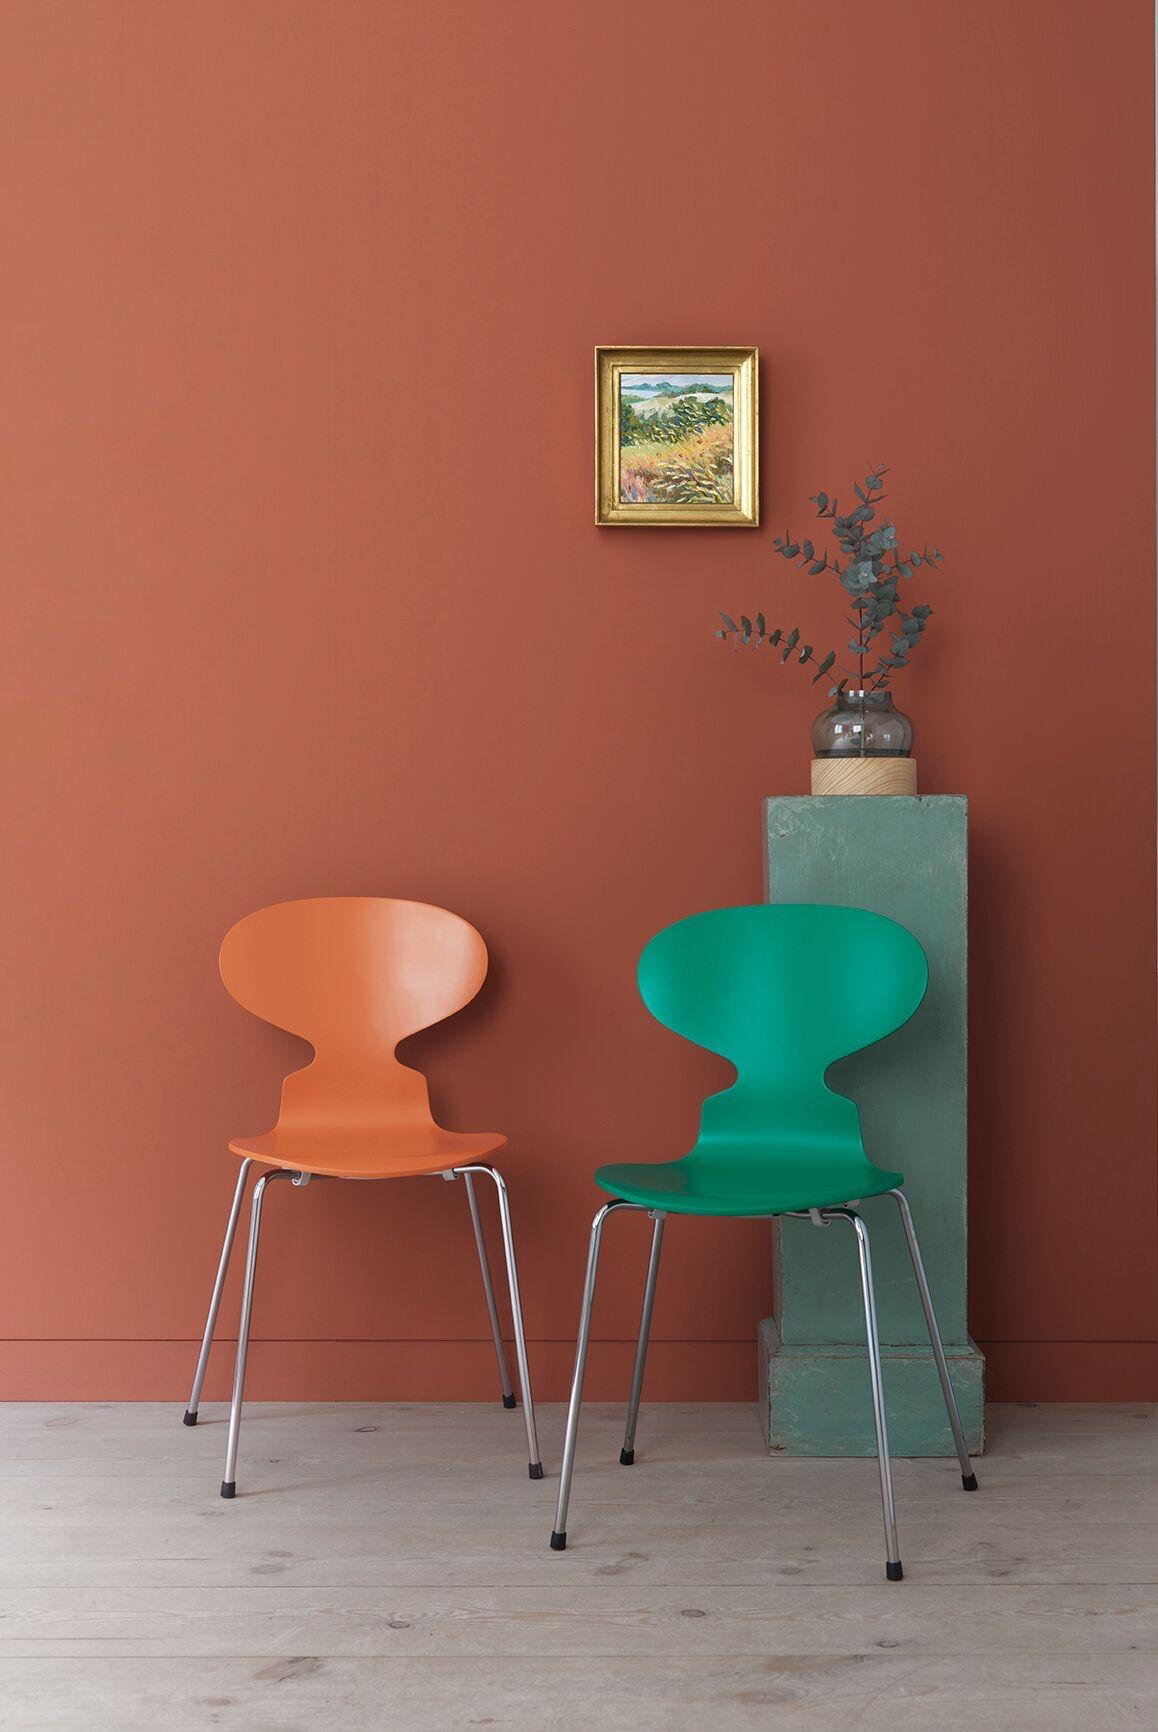 Ant™ inChevalier Orange andHüzün Green.Colours by Danish artist Tal R.